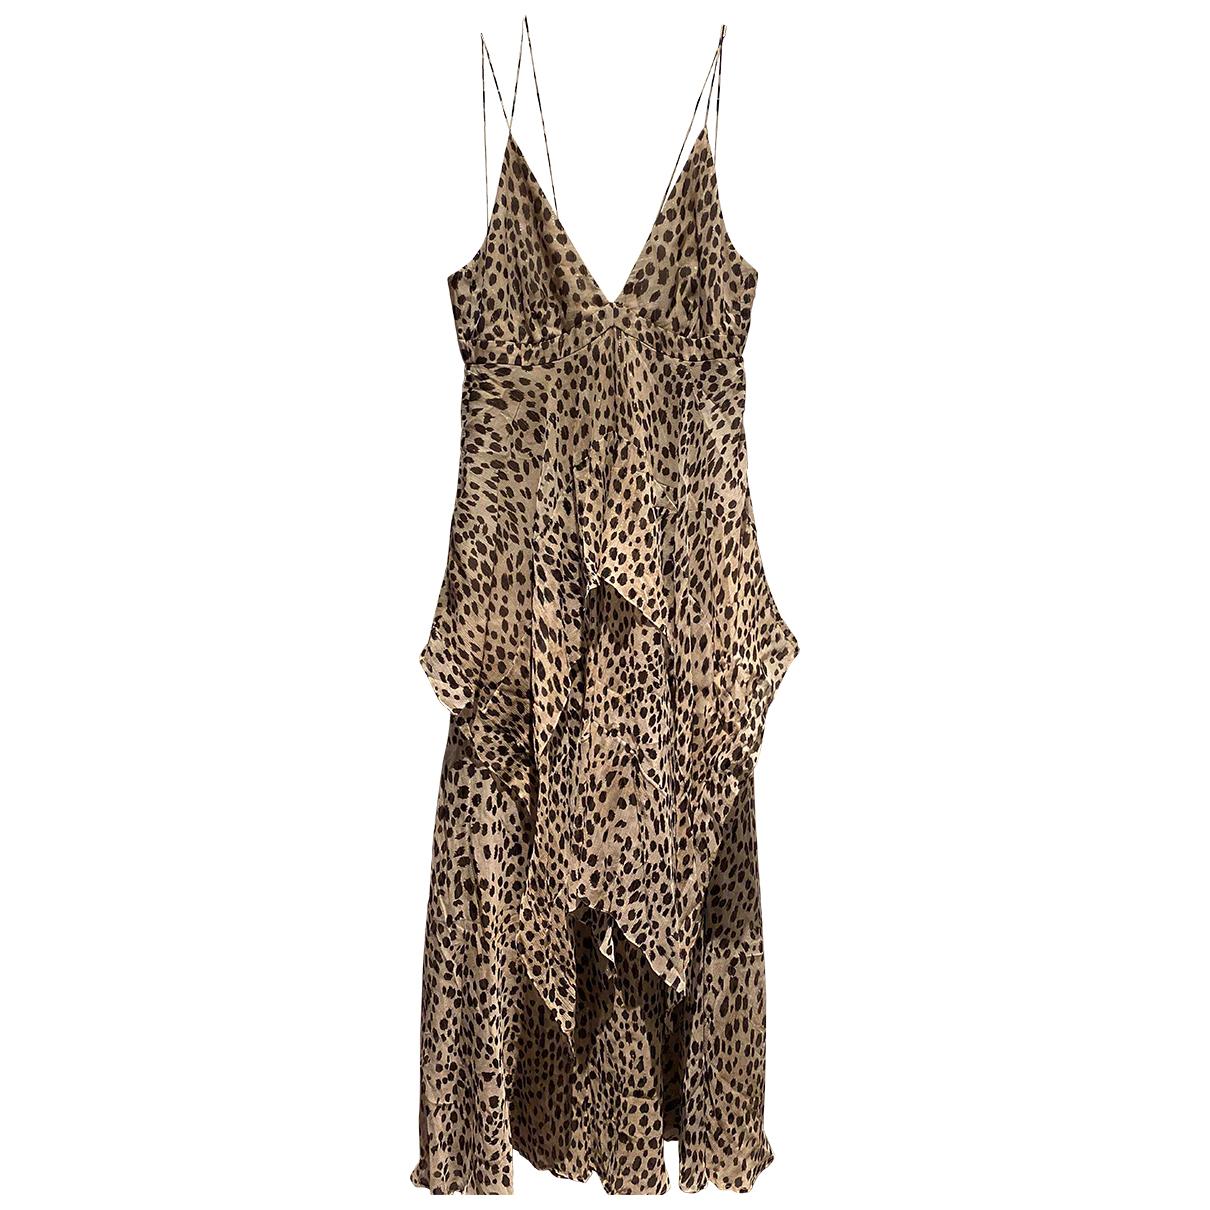 Roberto Cavalli N Multicolour Silk dress for Women 8 US